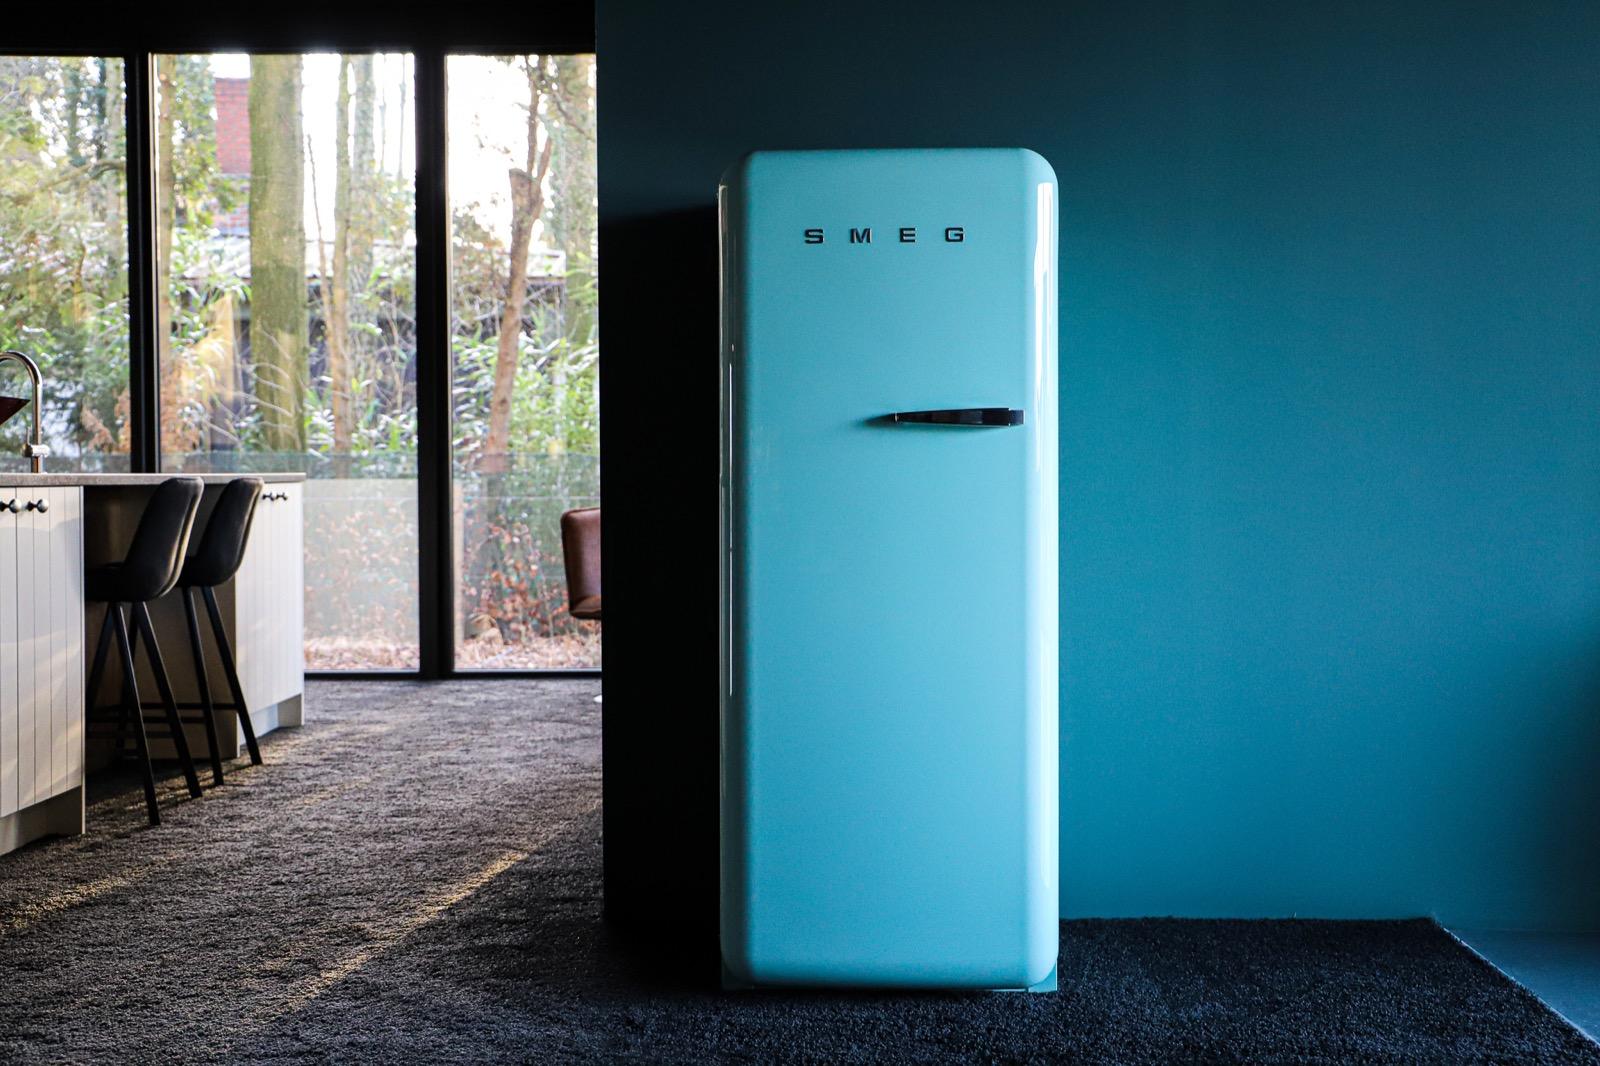 Amerikaanse koelkast, inbouwkoelkast of koel-vriescombinatie?